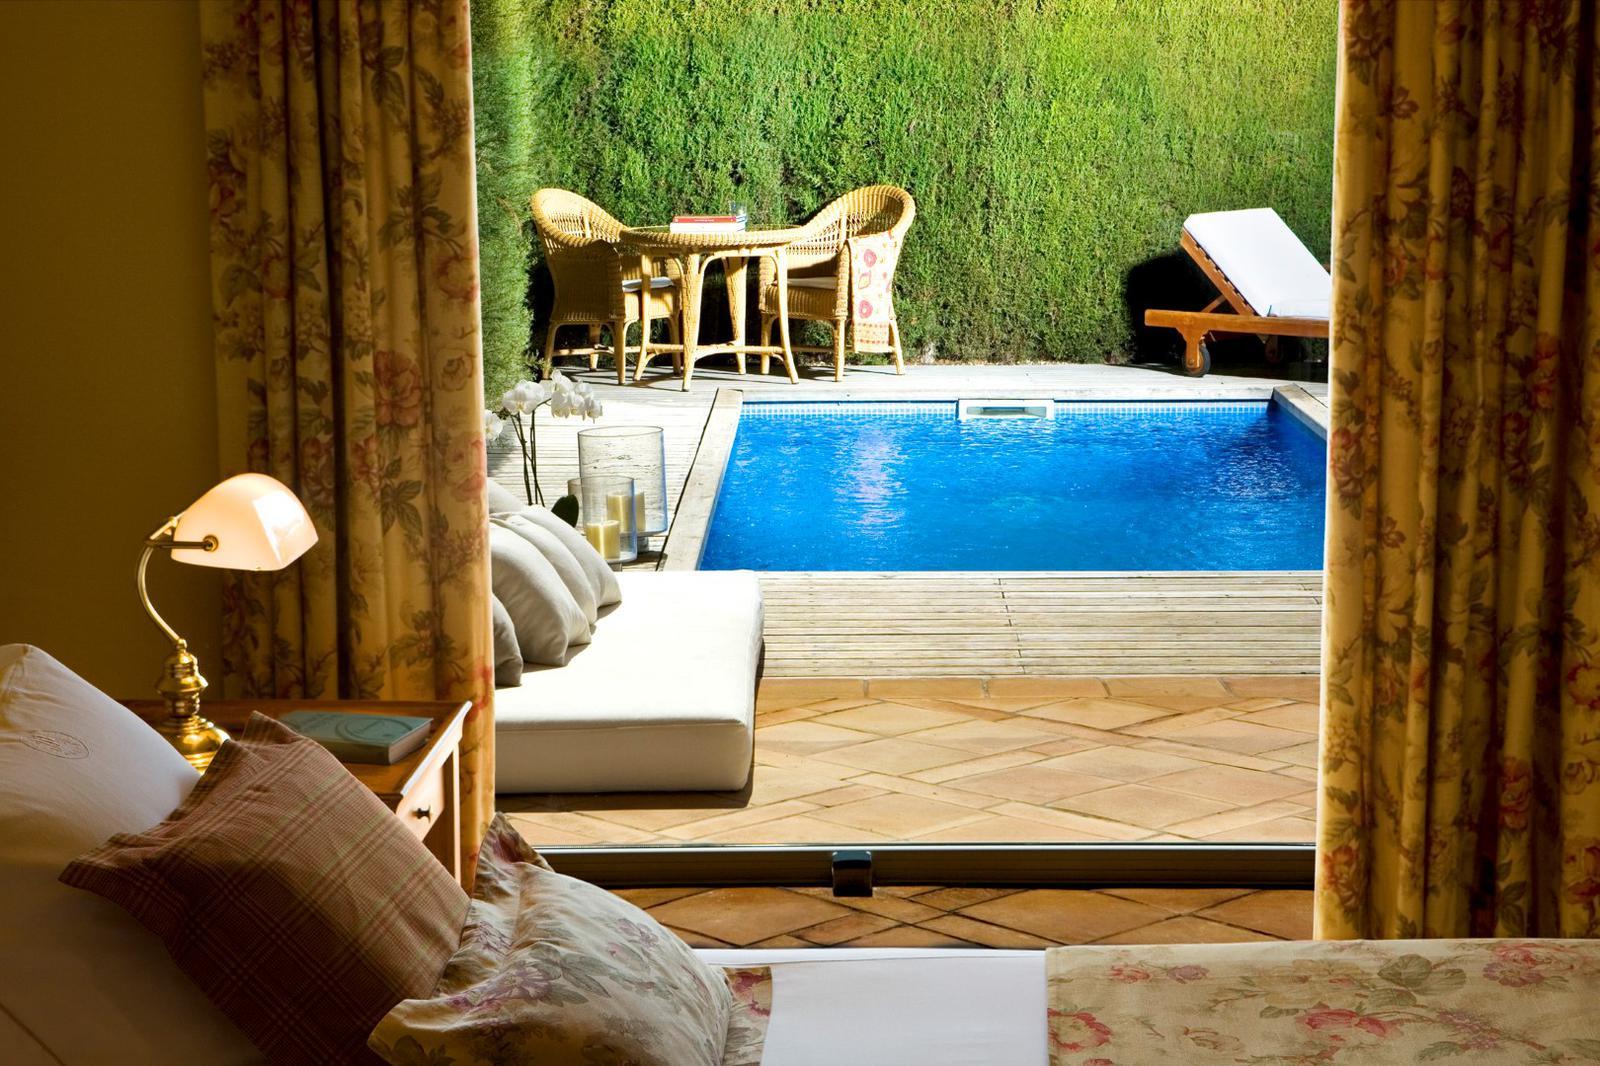 7 habitaciones de hotel con piscina privada for Hoteles sevilla con piscina